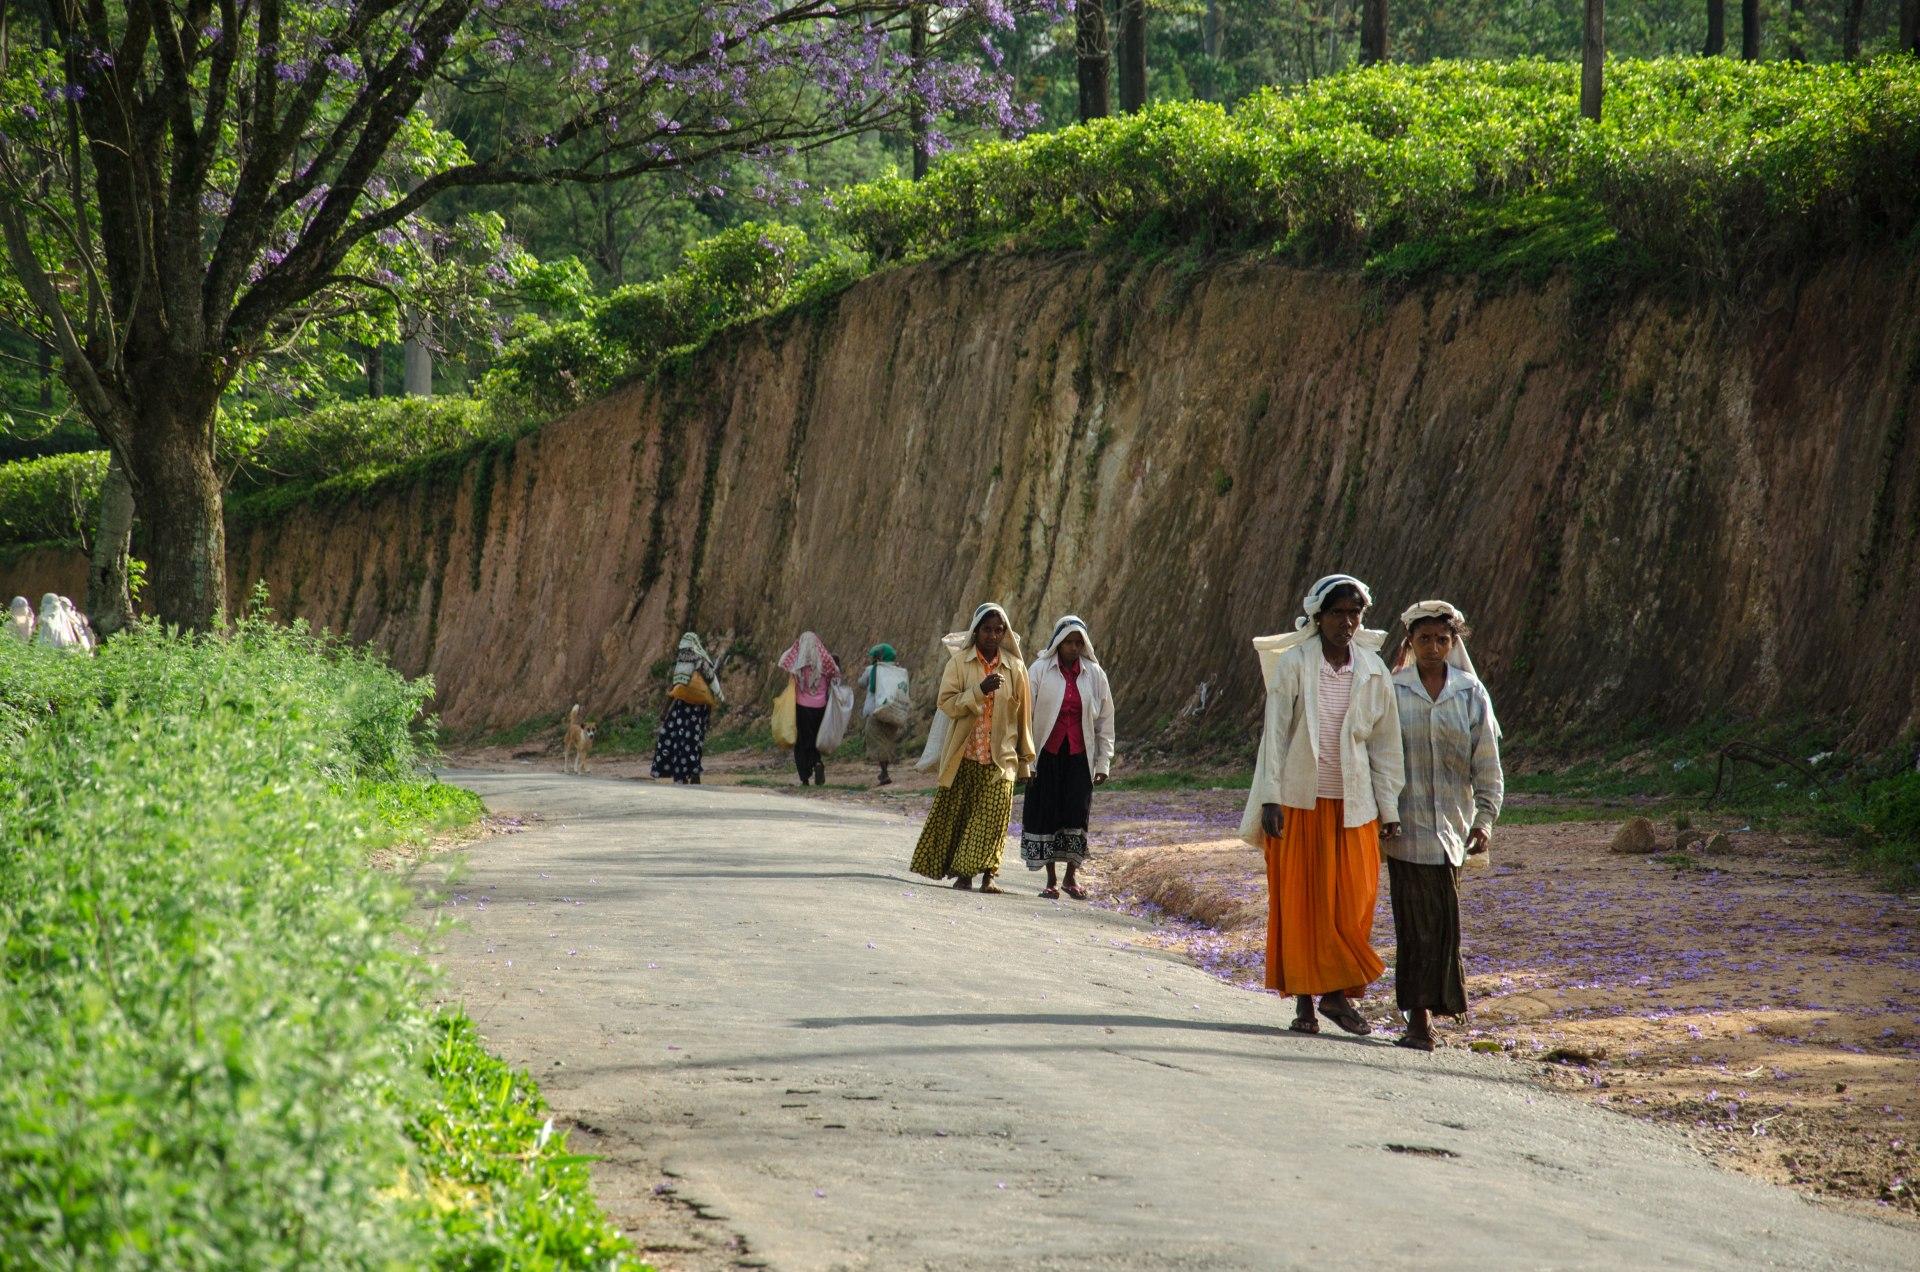 Strade in Sri Lanka - foto @GabrieleSaluci